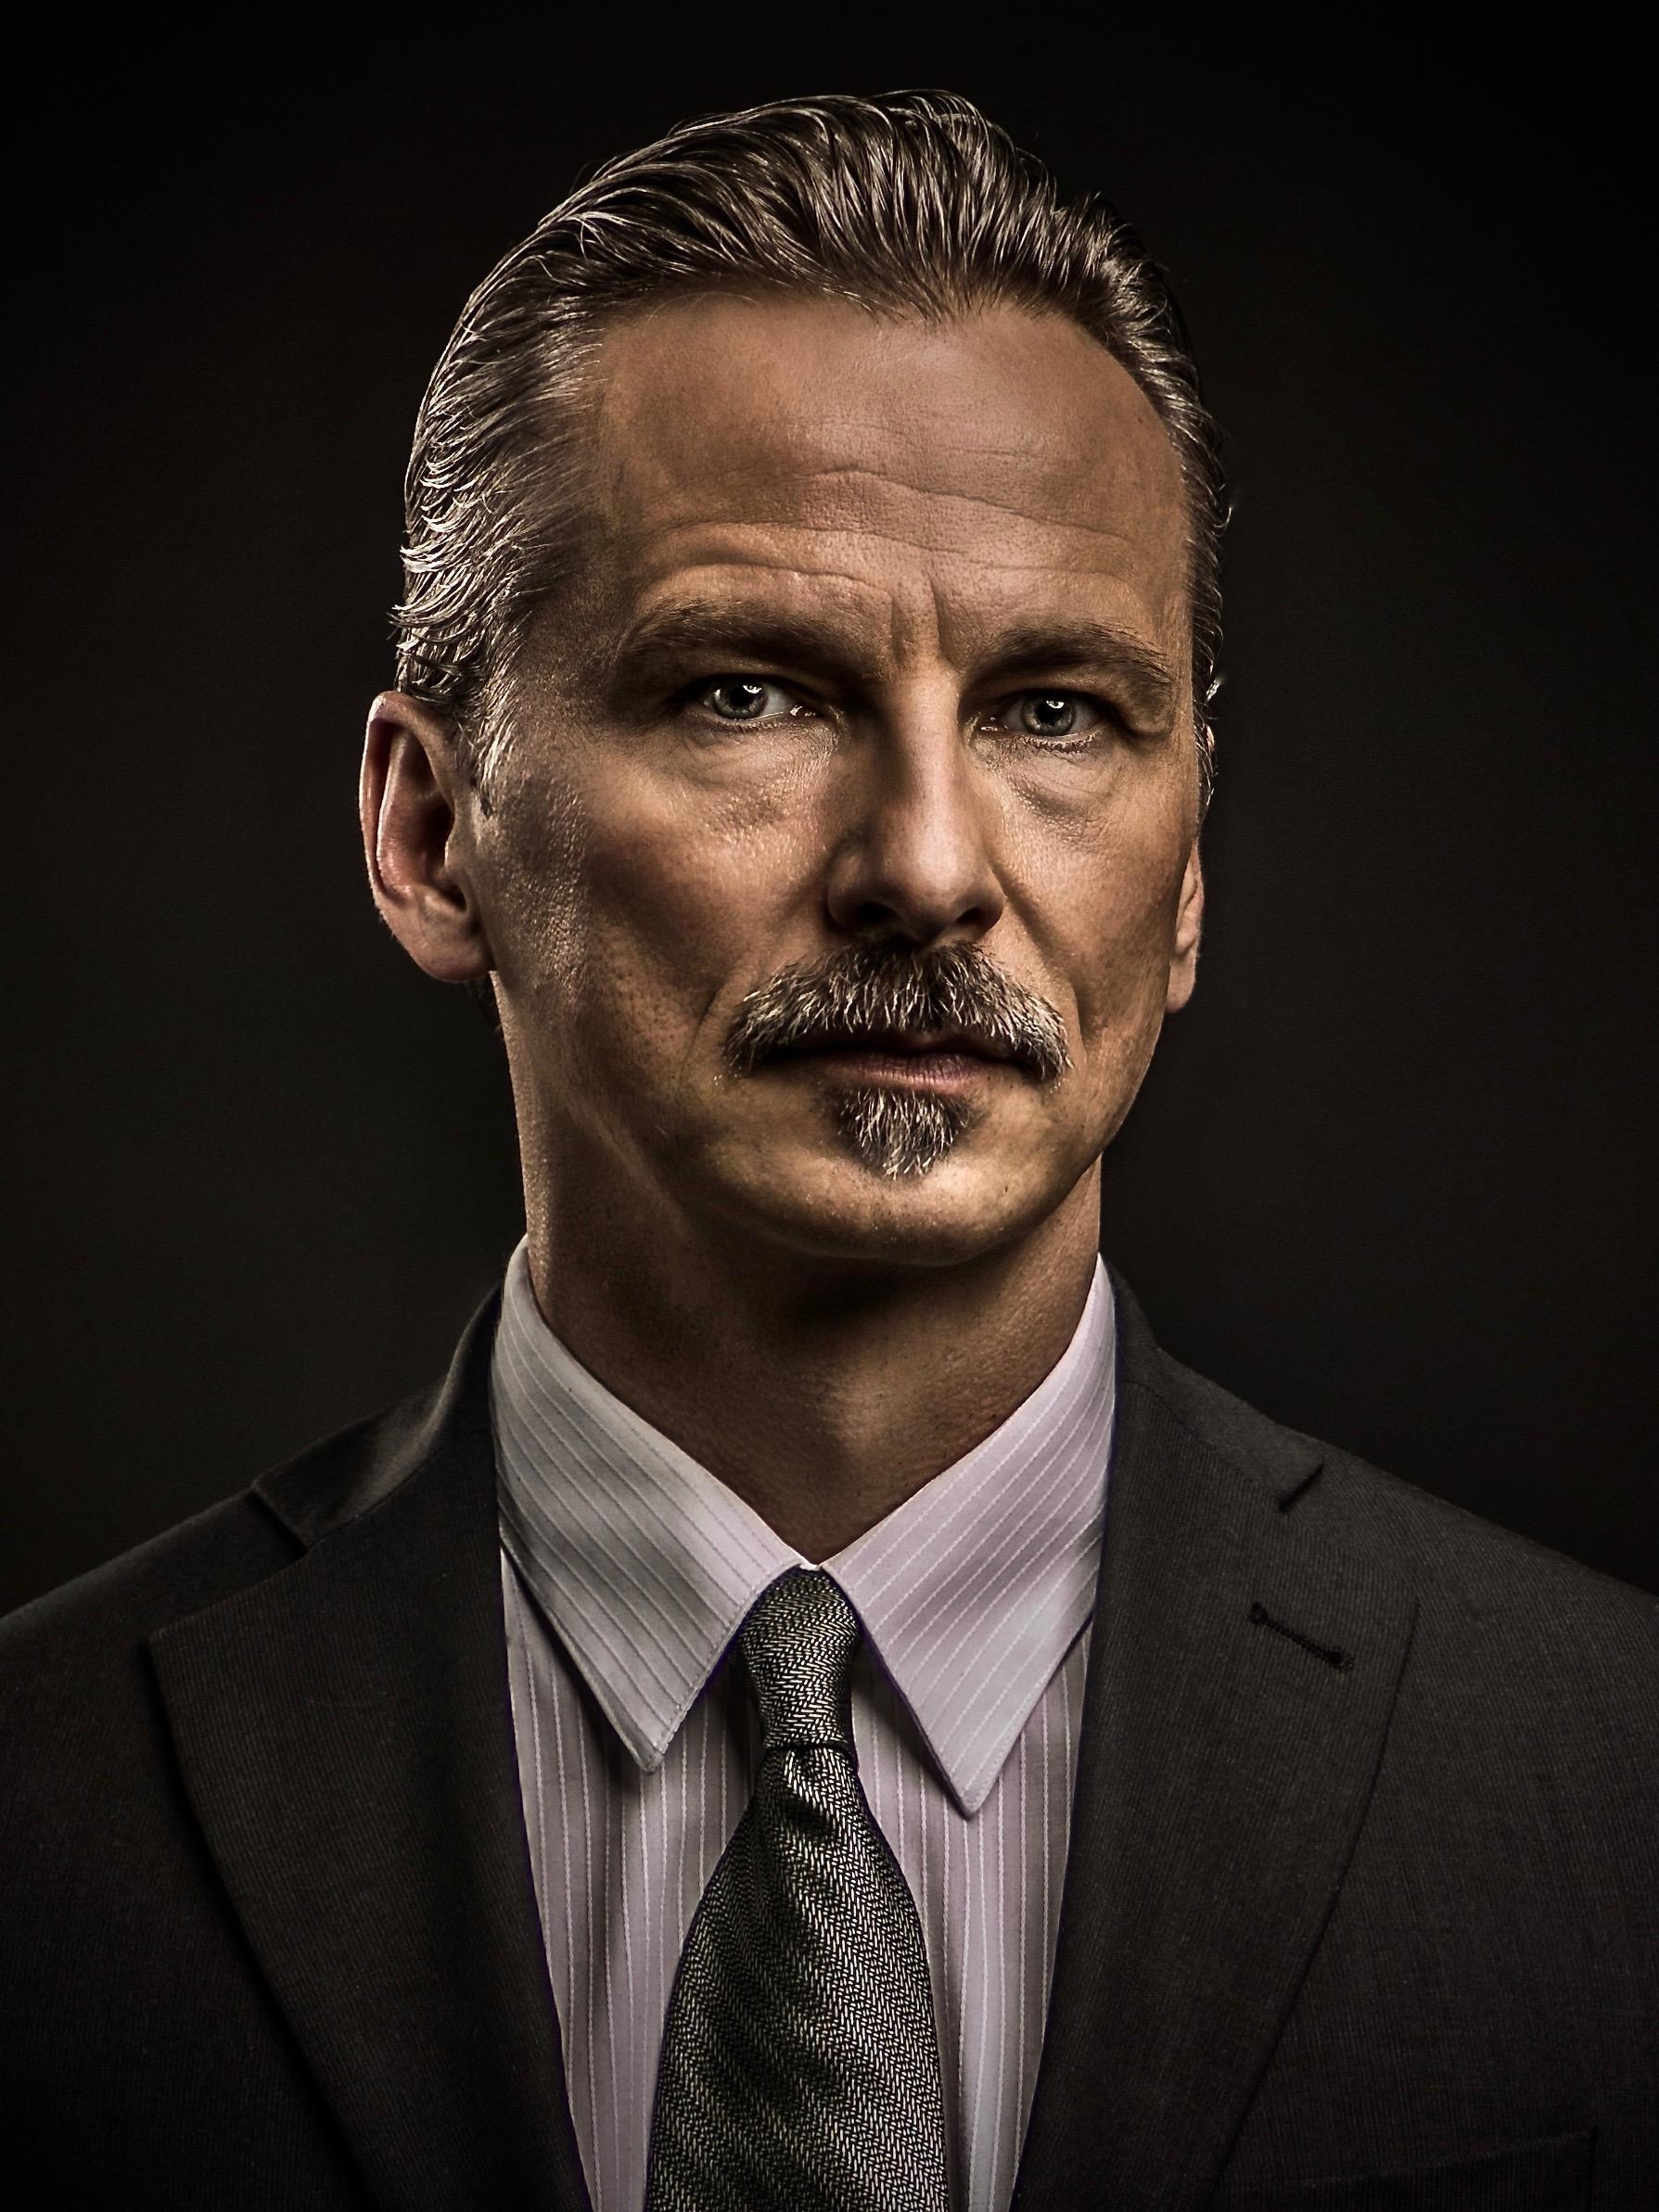 German actor DAVID BUNNERS